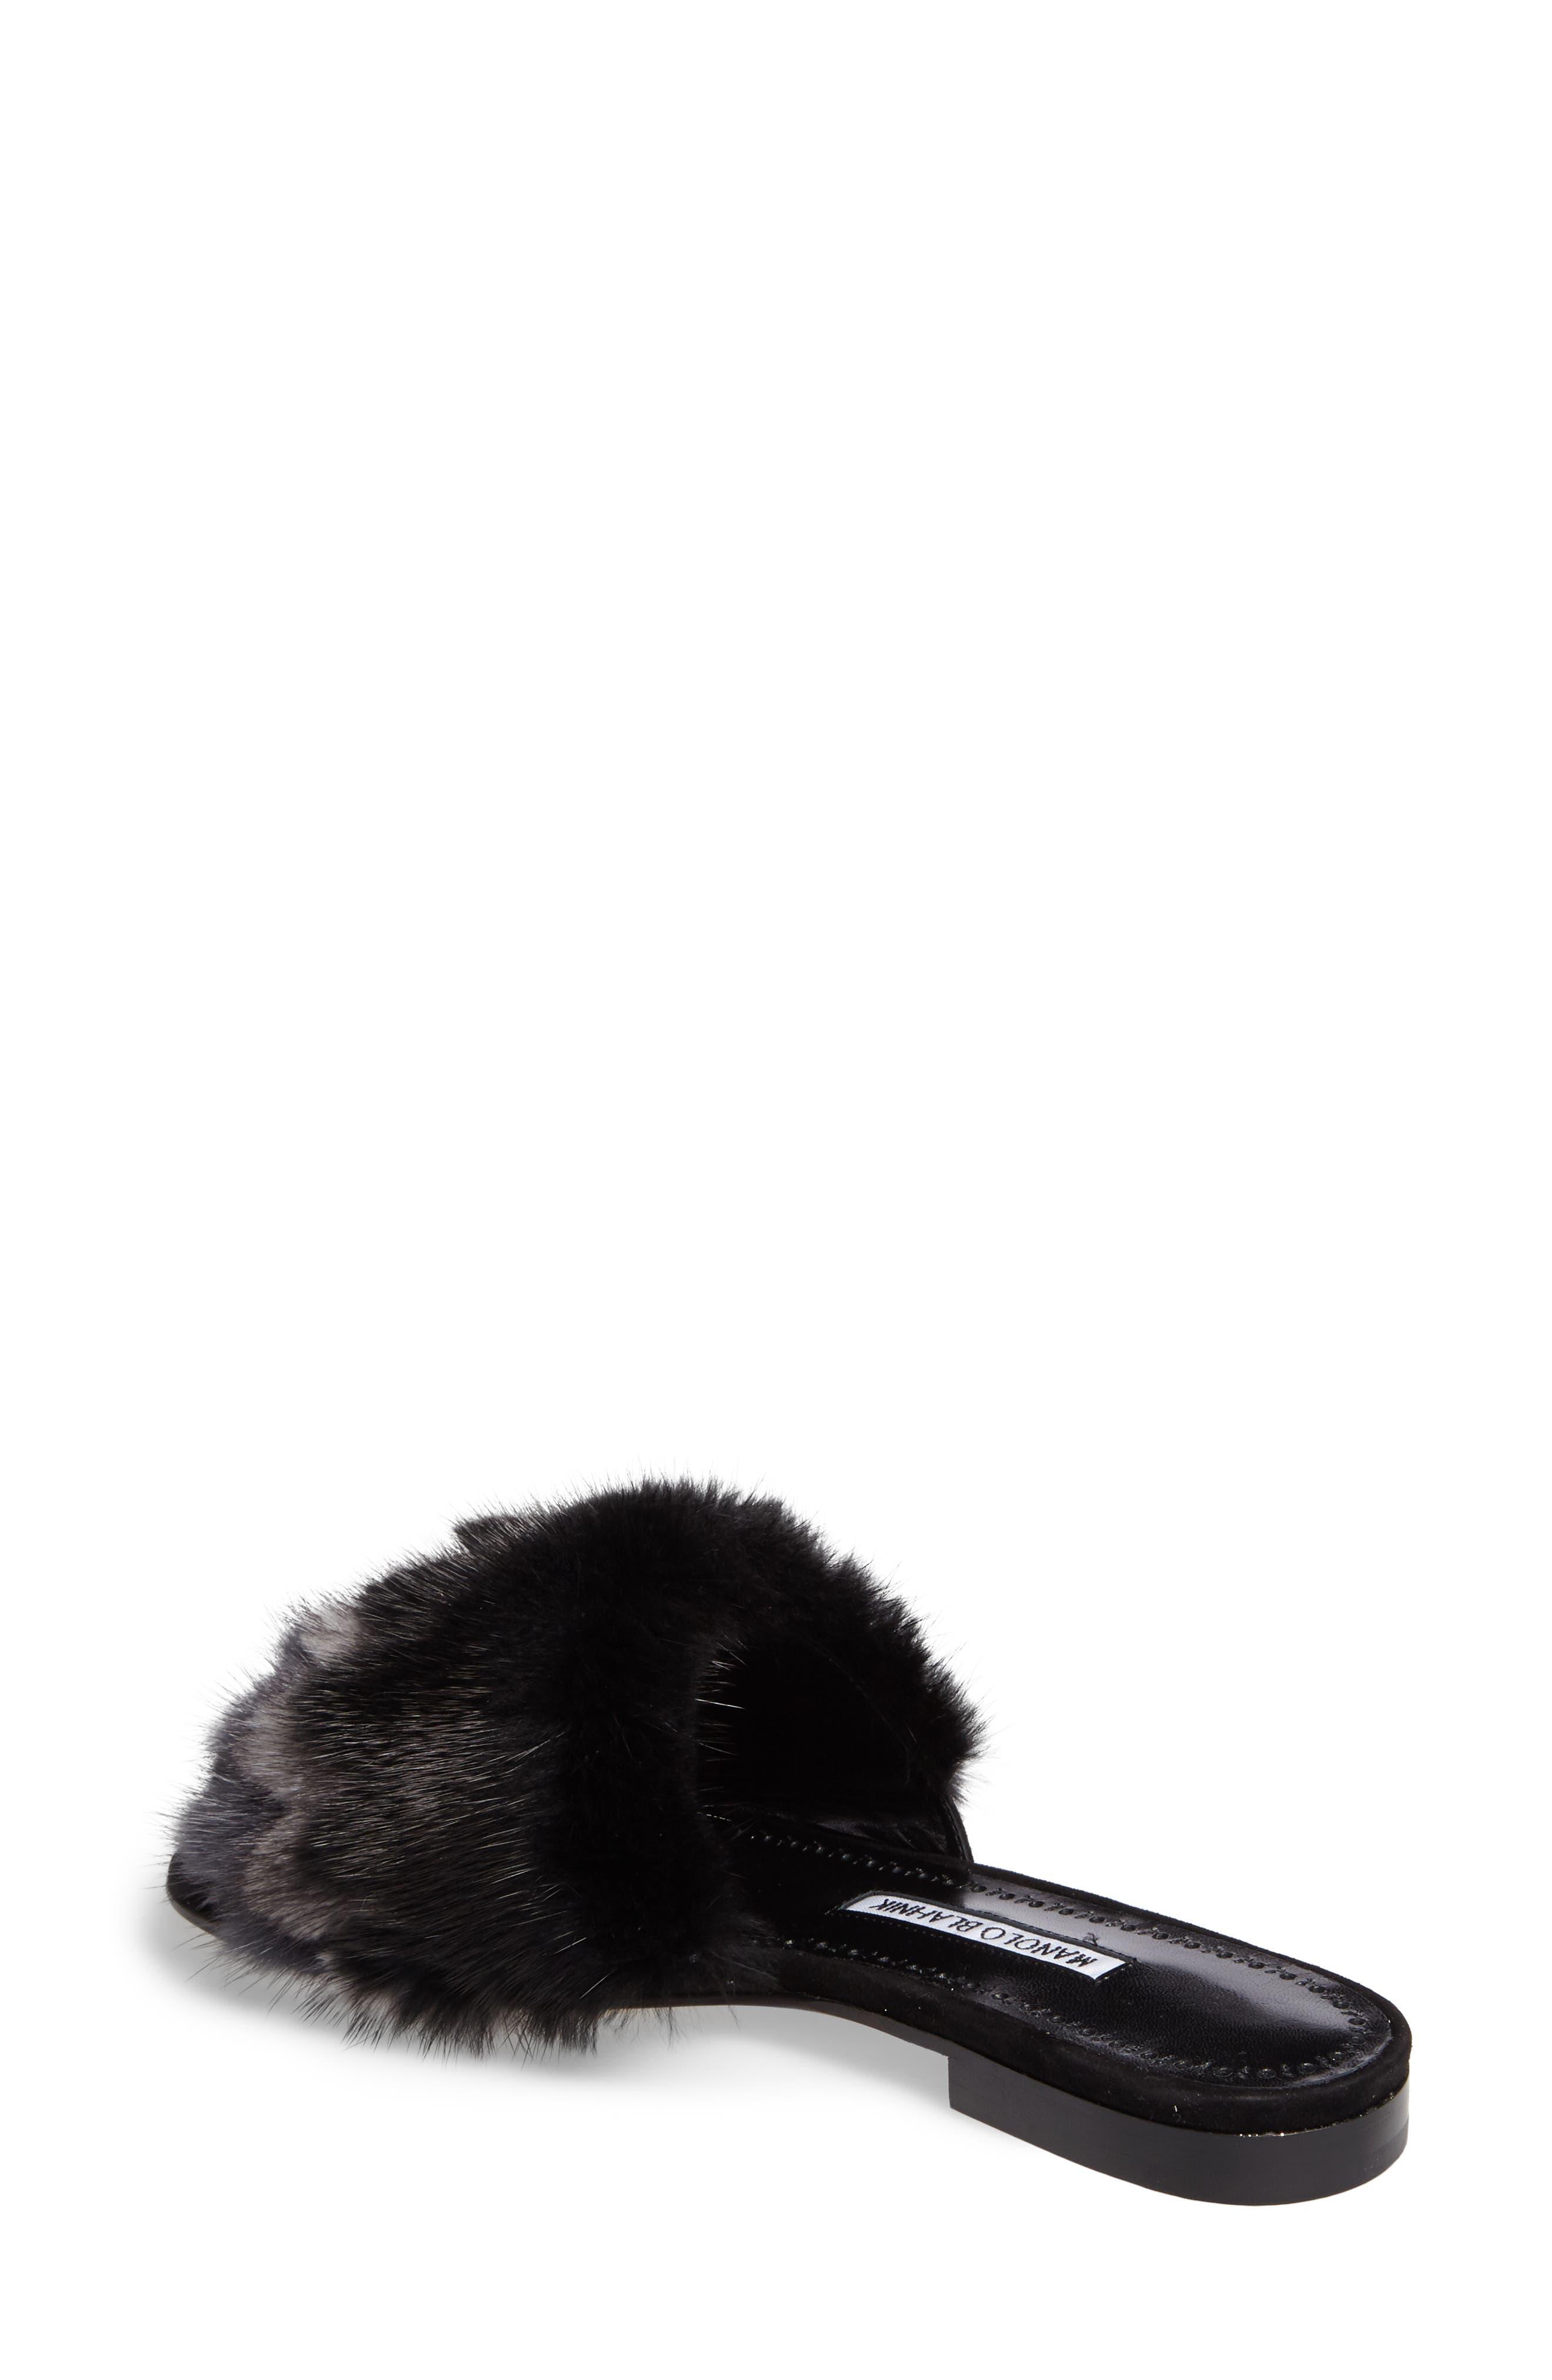 Alternate Image 2  - Manolo Blahnik Pelosusmin Genuine Mink Fur Slide Sandal (Women)